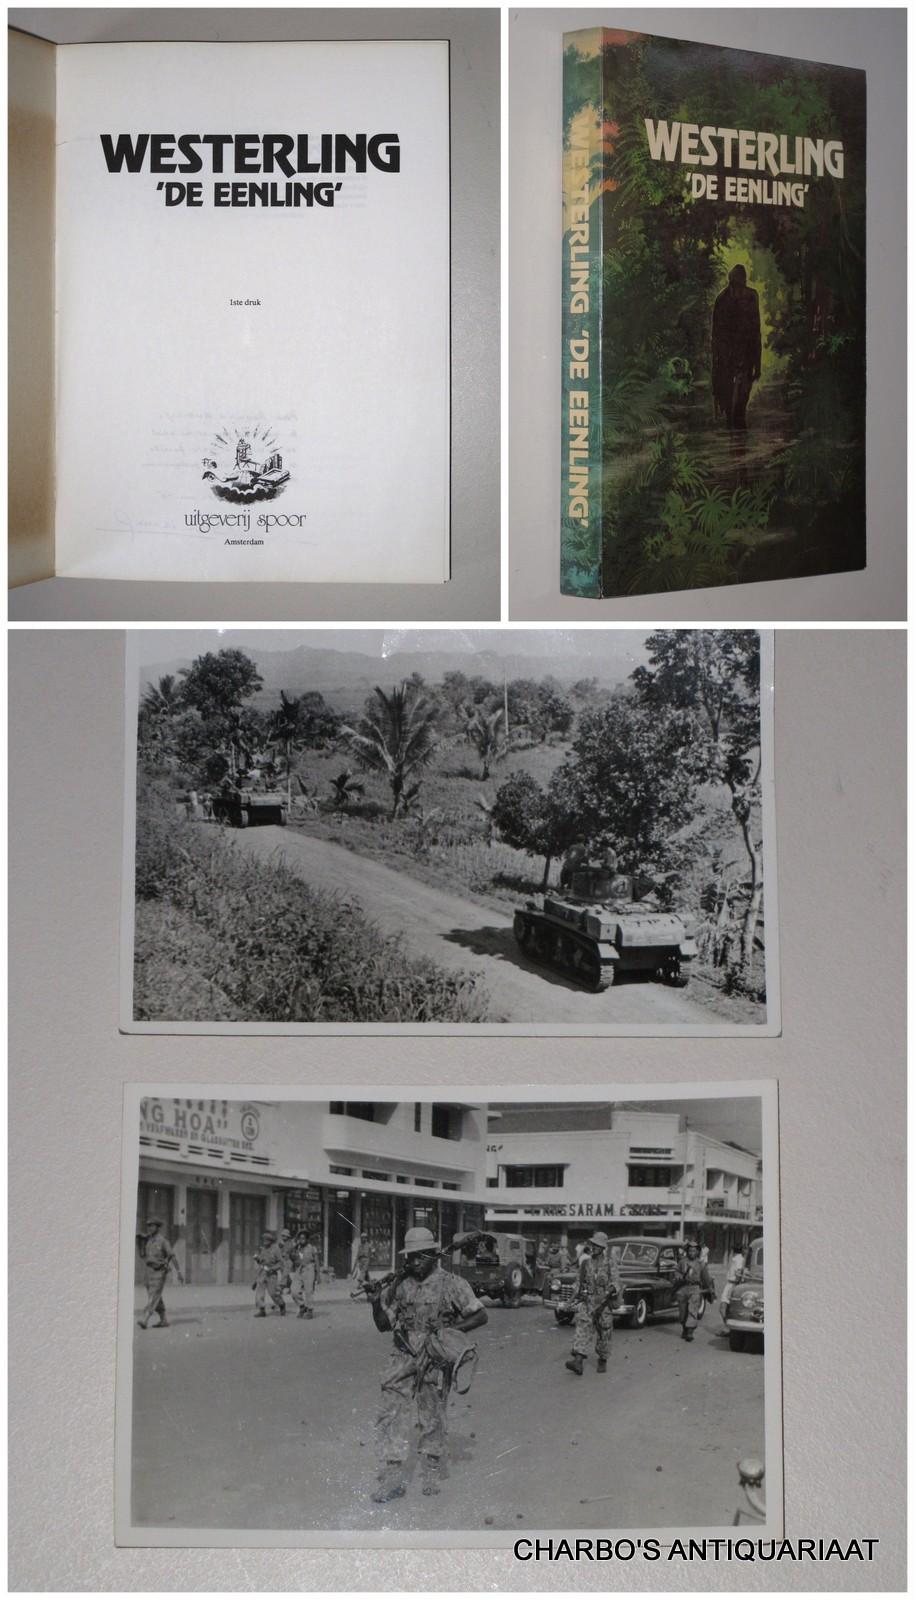 VENNER, DOMINIQUE & WESTERLING, R.P.P., -  Westerling, de eenling.